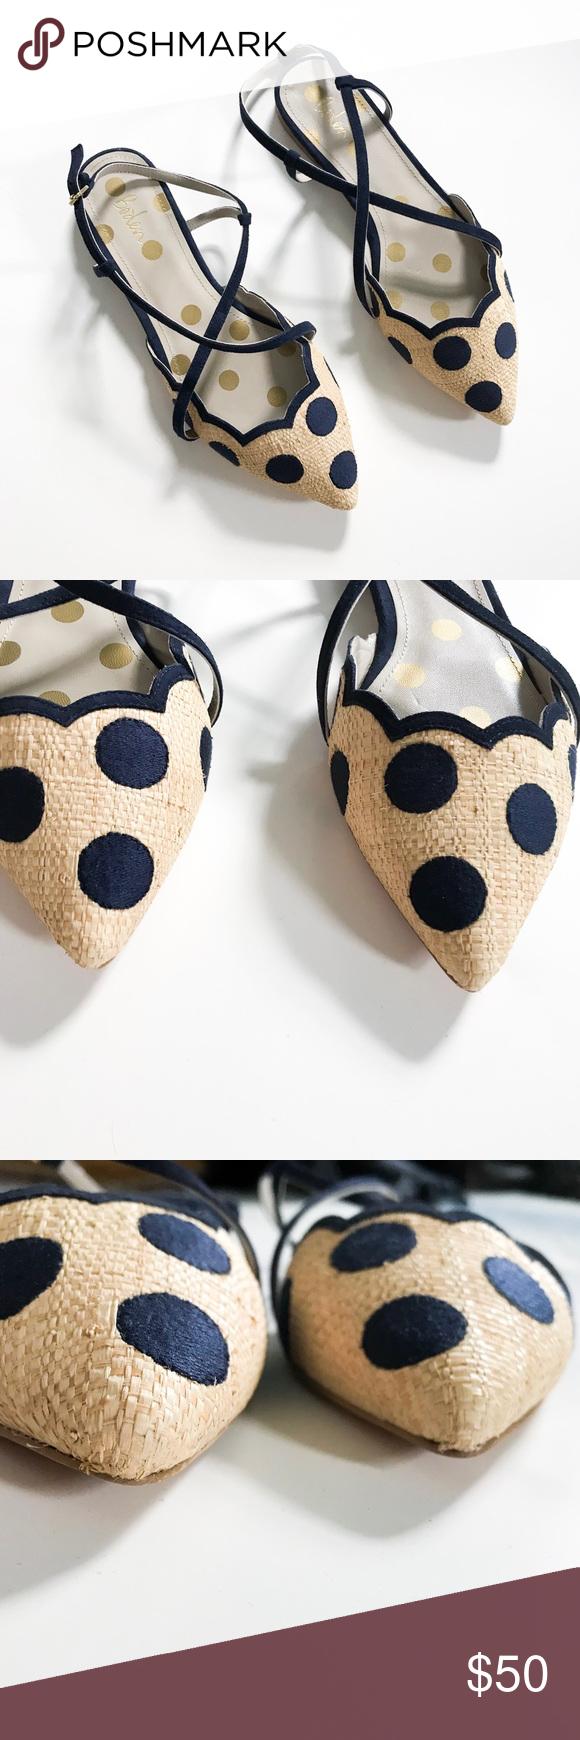 Navy polka dots, Boden shoes